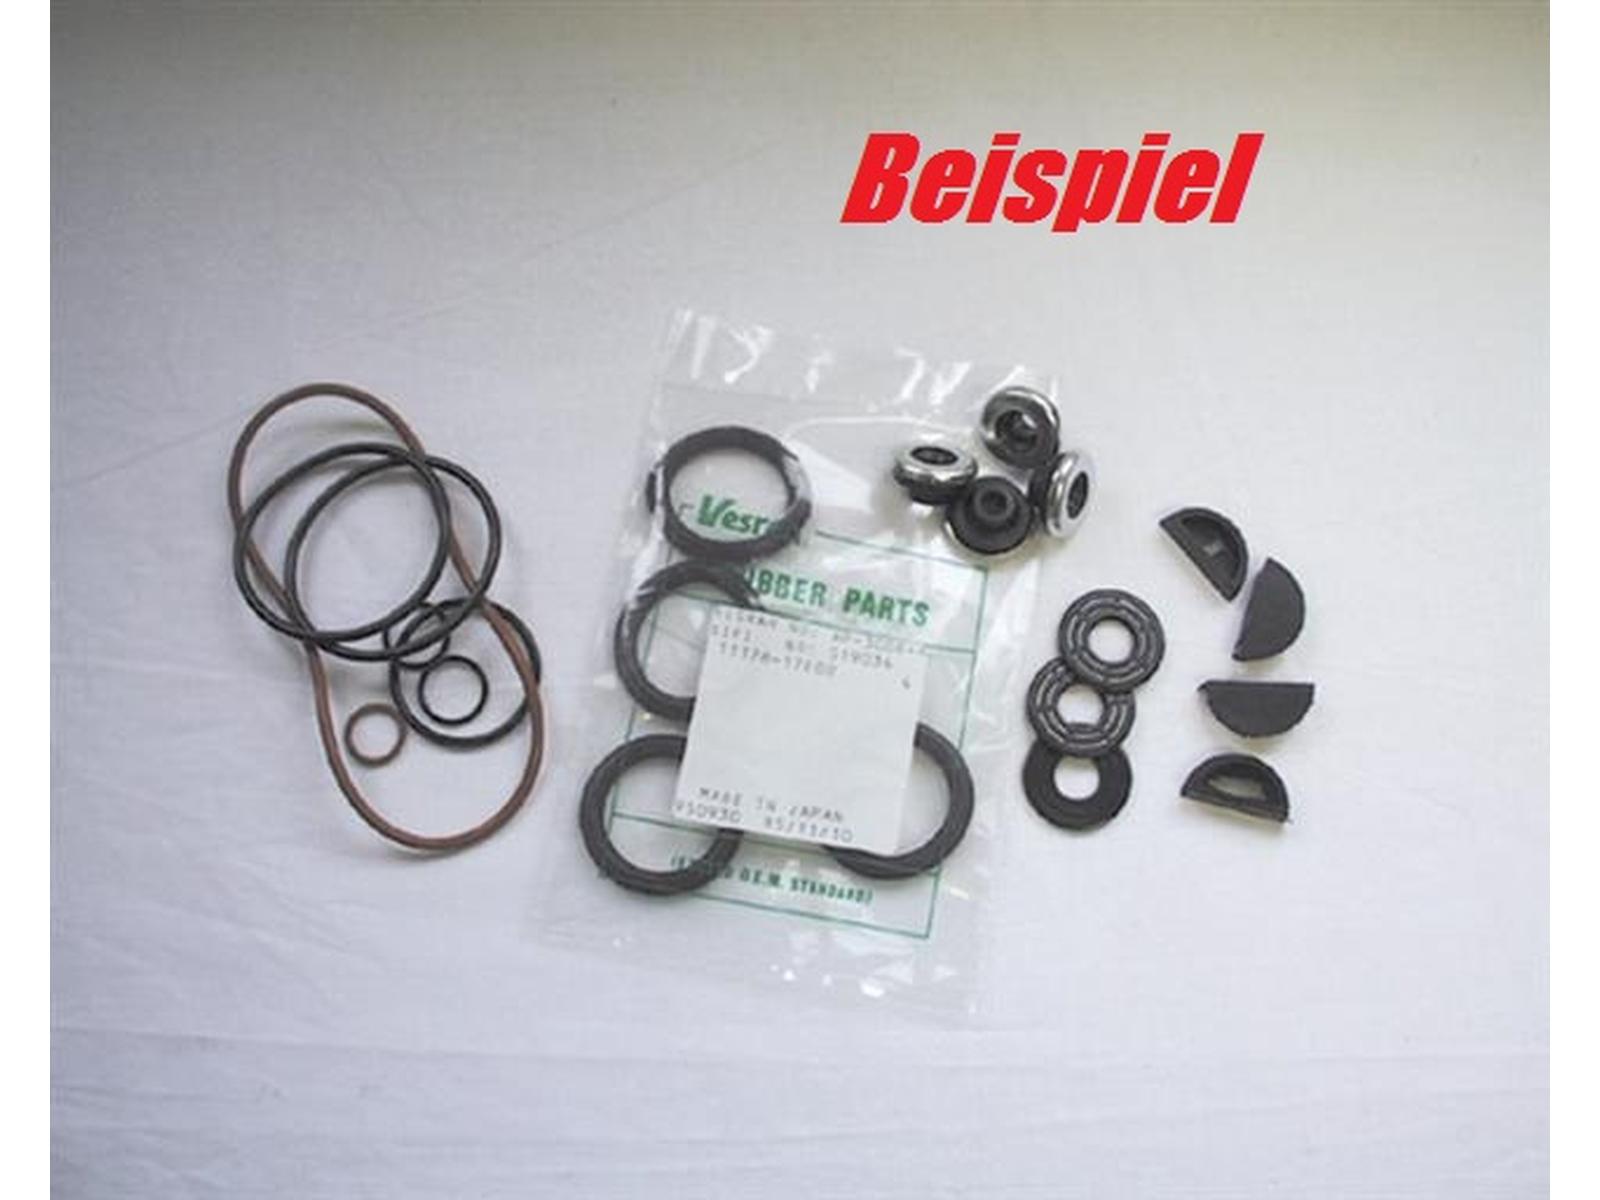 Ventildeckeldichtung Kawasaki Zr 750 C3/4 93-94